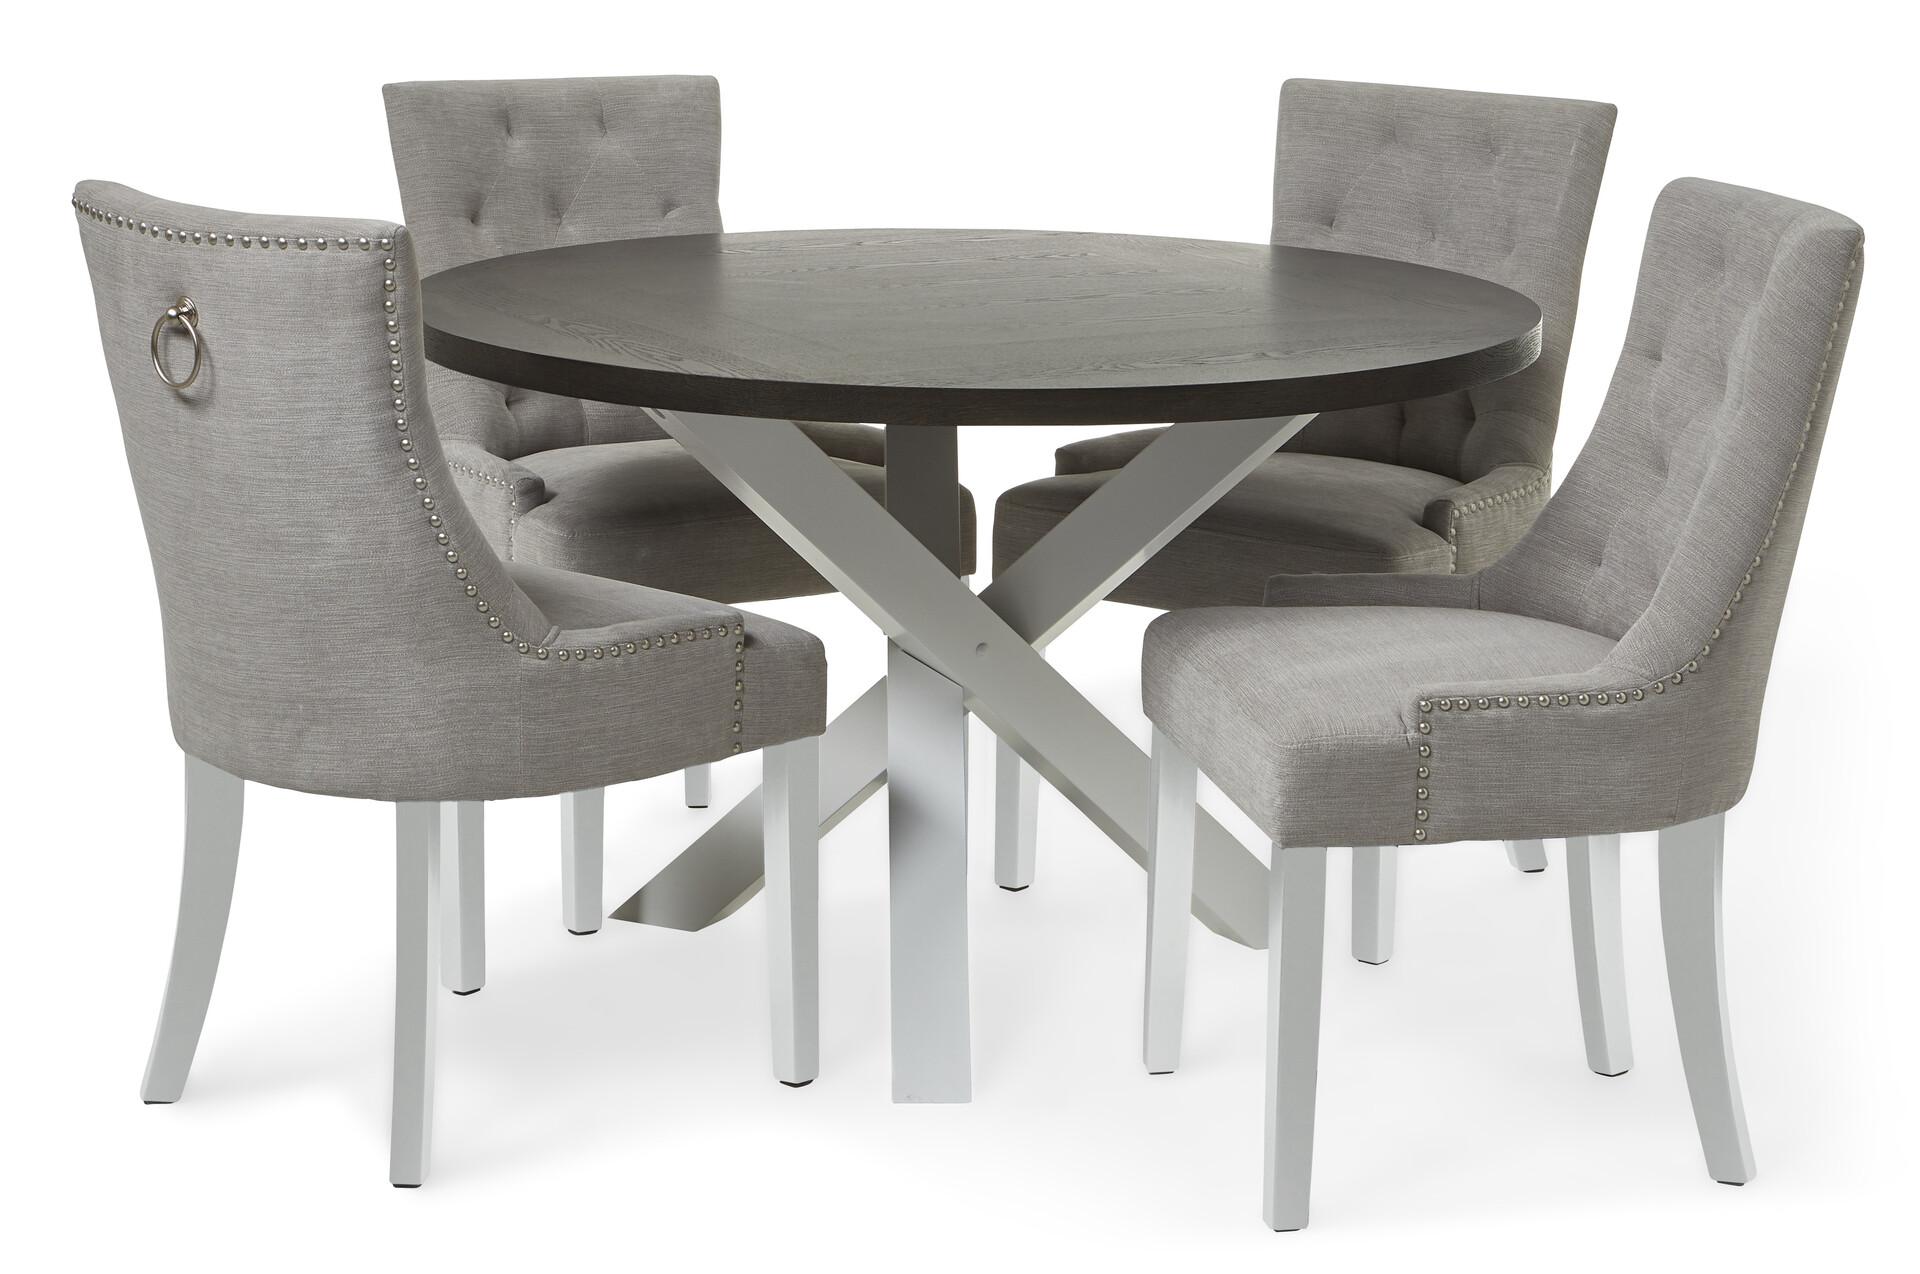 Splitter nya Portland Matgrupp med 4 stolar Charlotte | Matbord | Mio QO-85